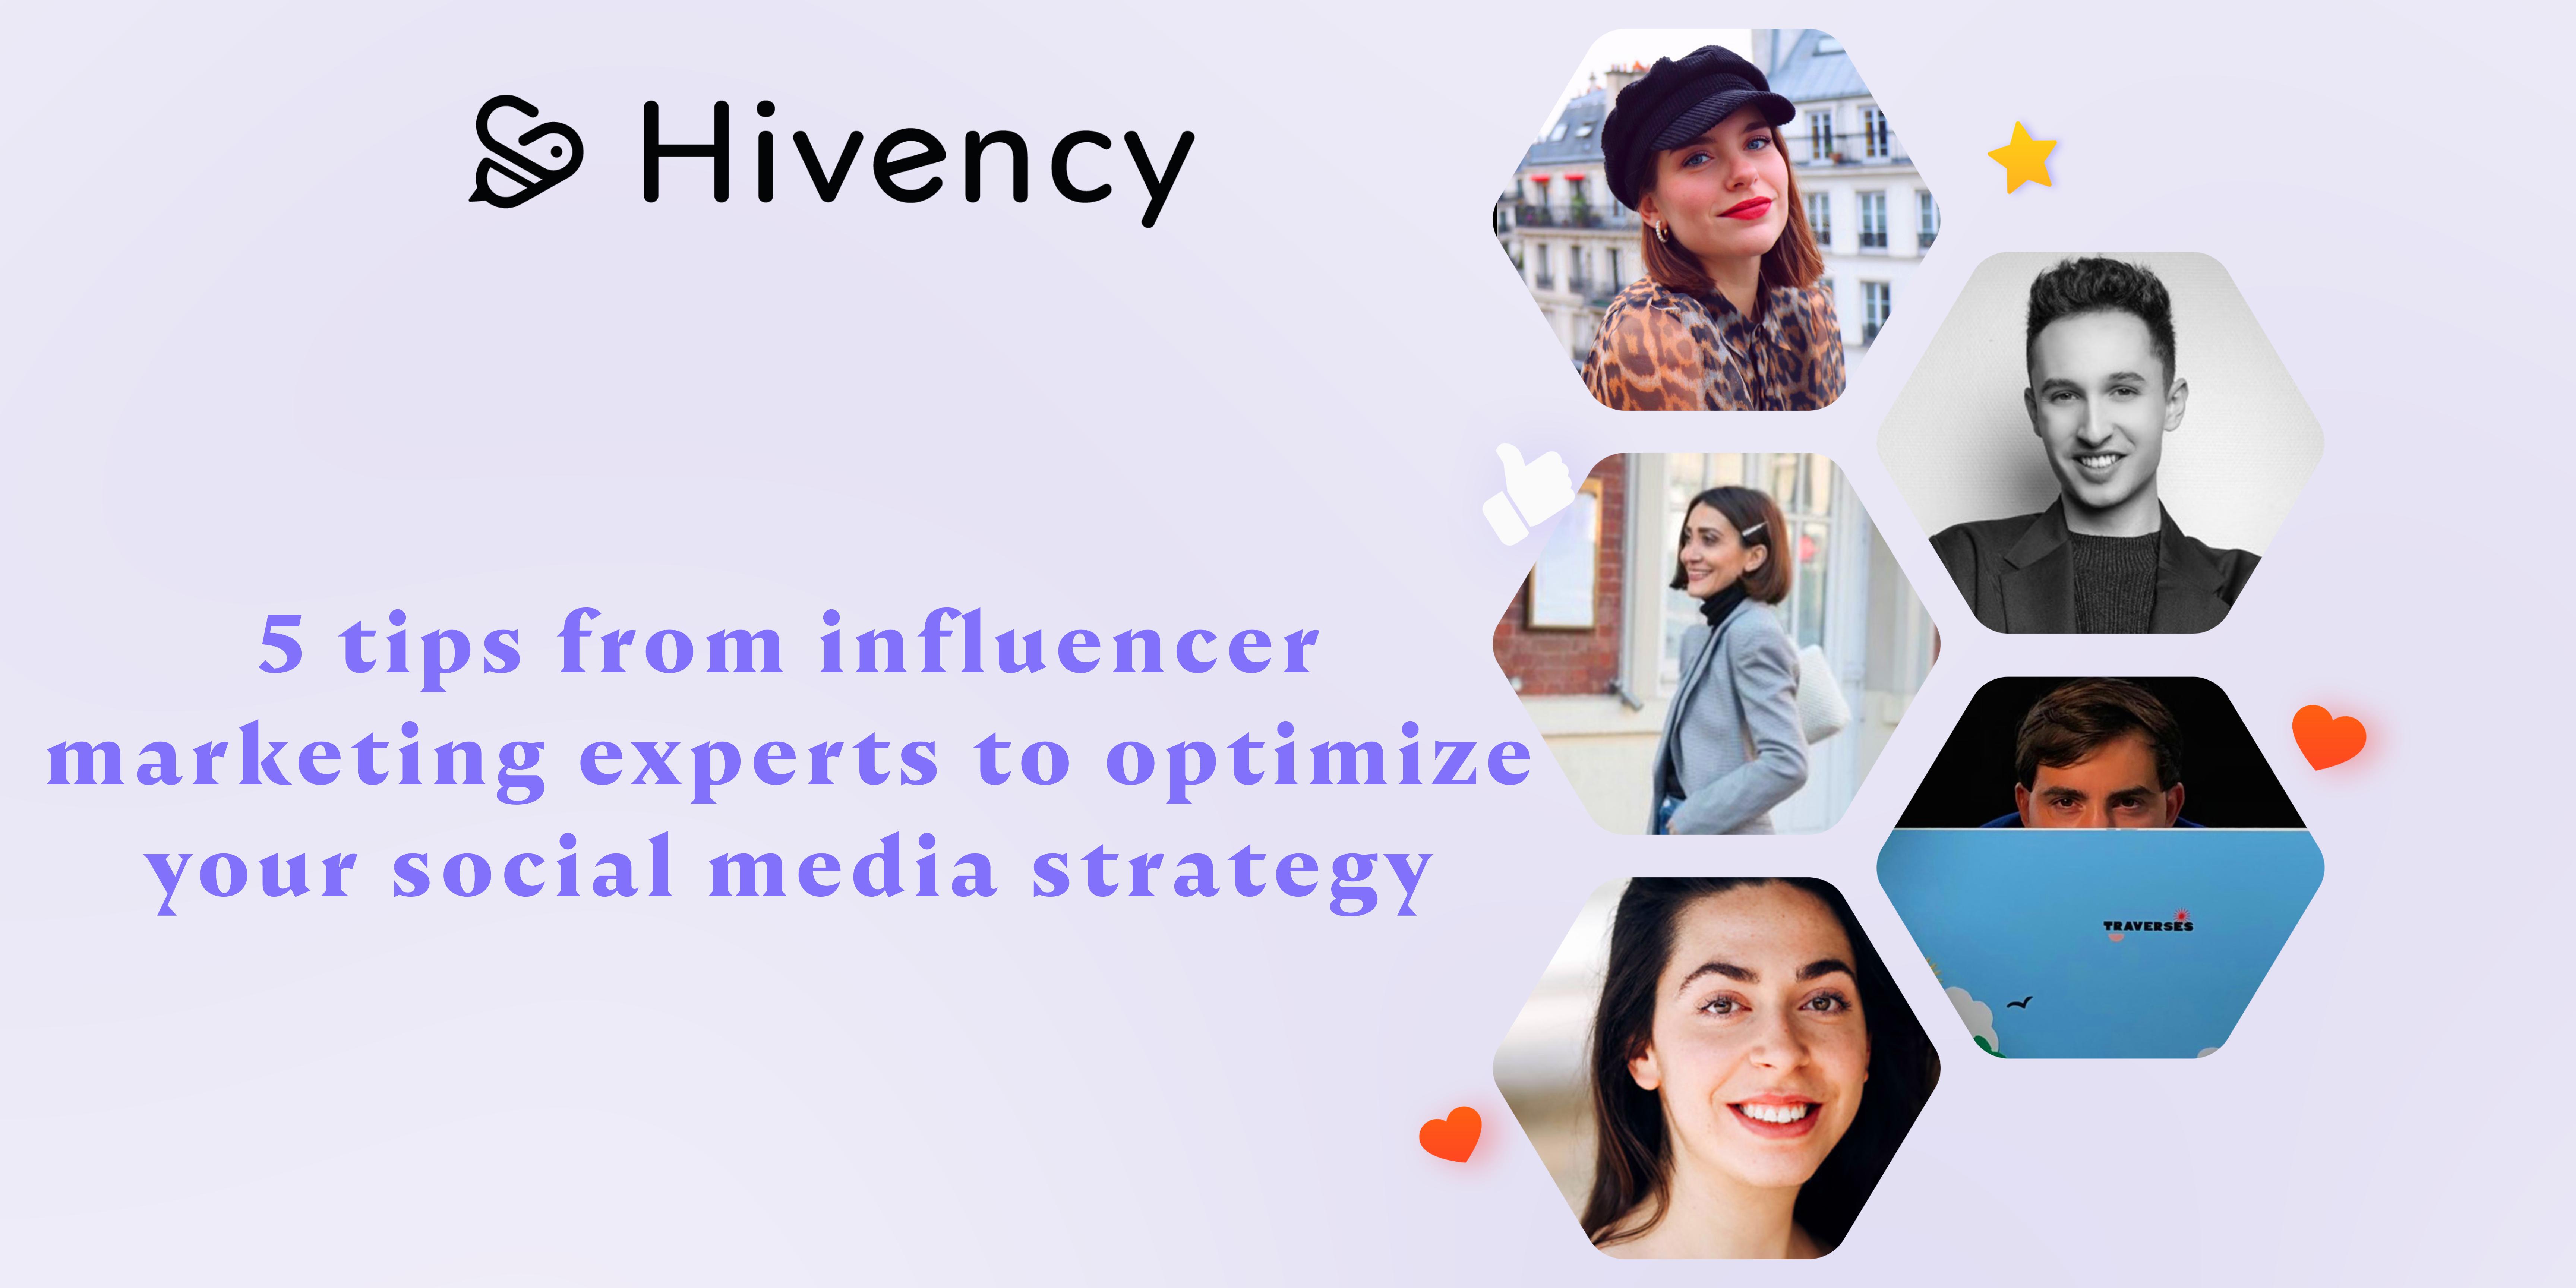 tips influencer marketing_Hivency blog